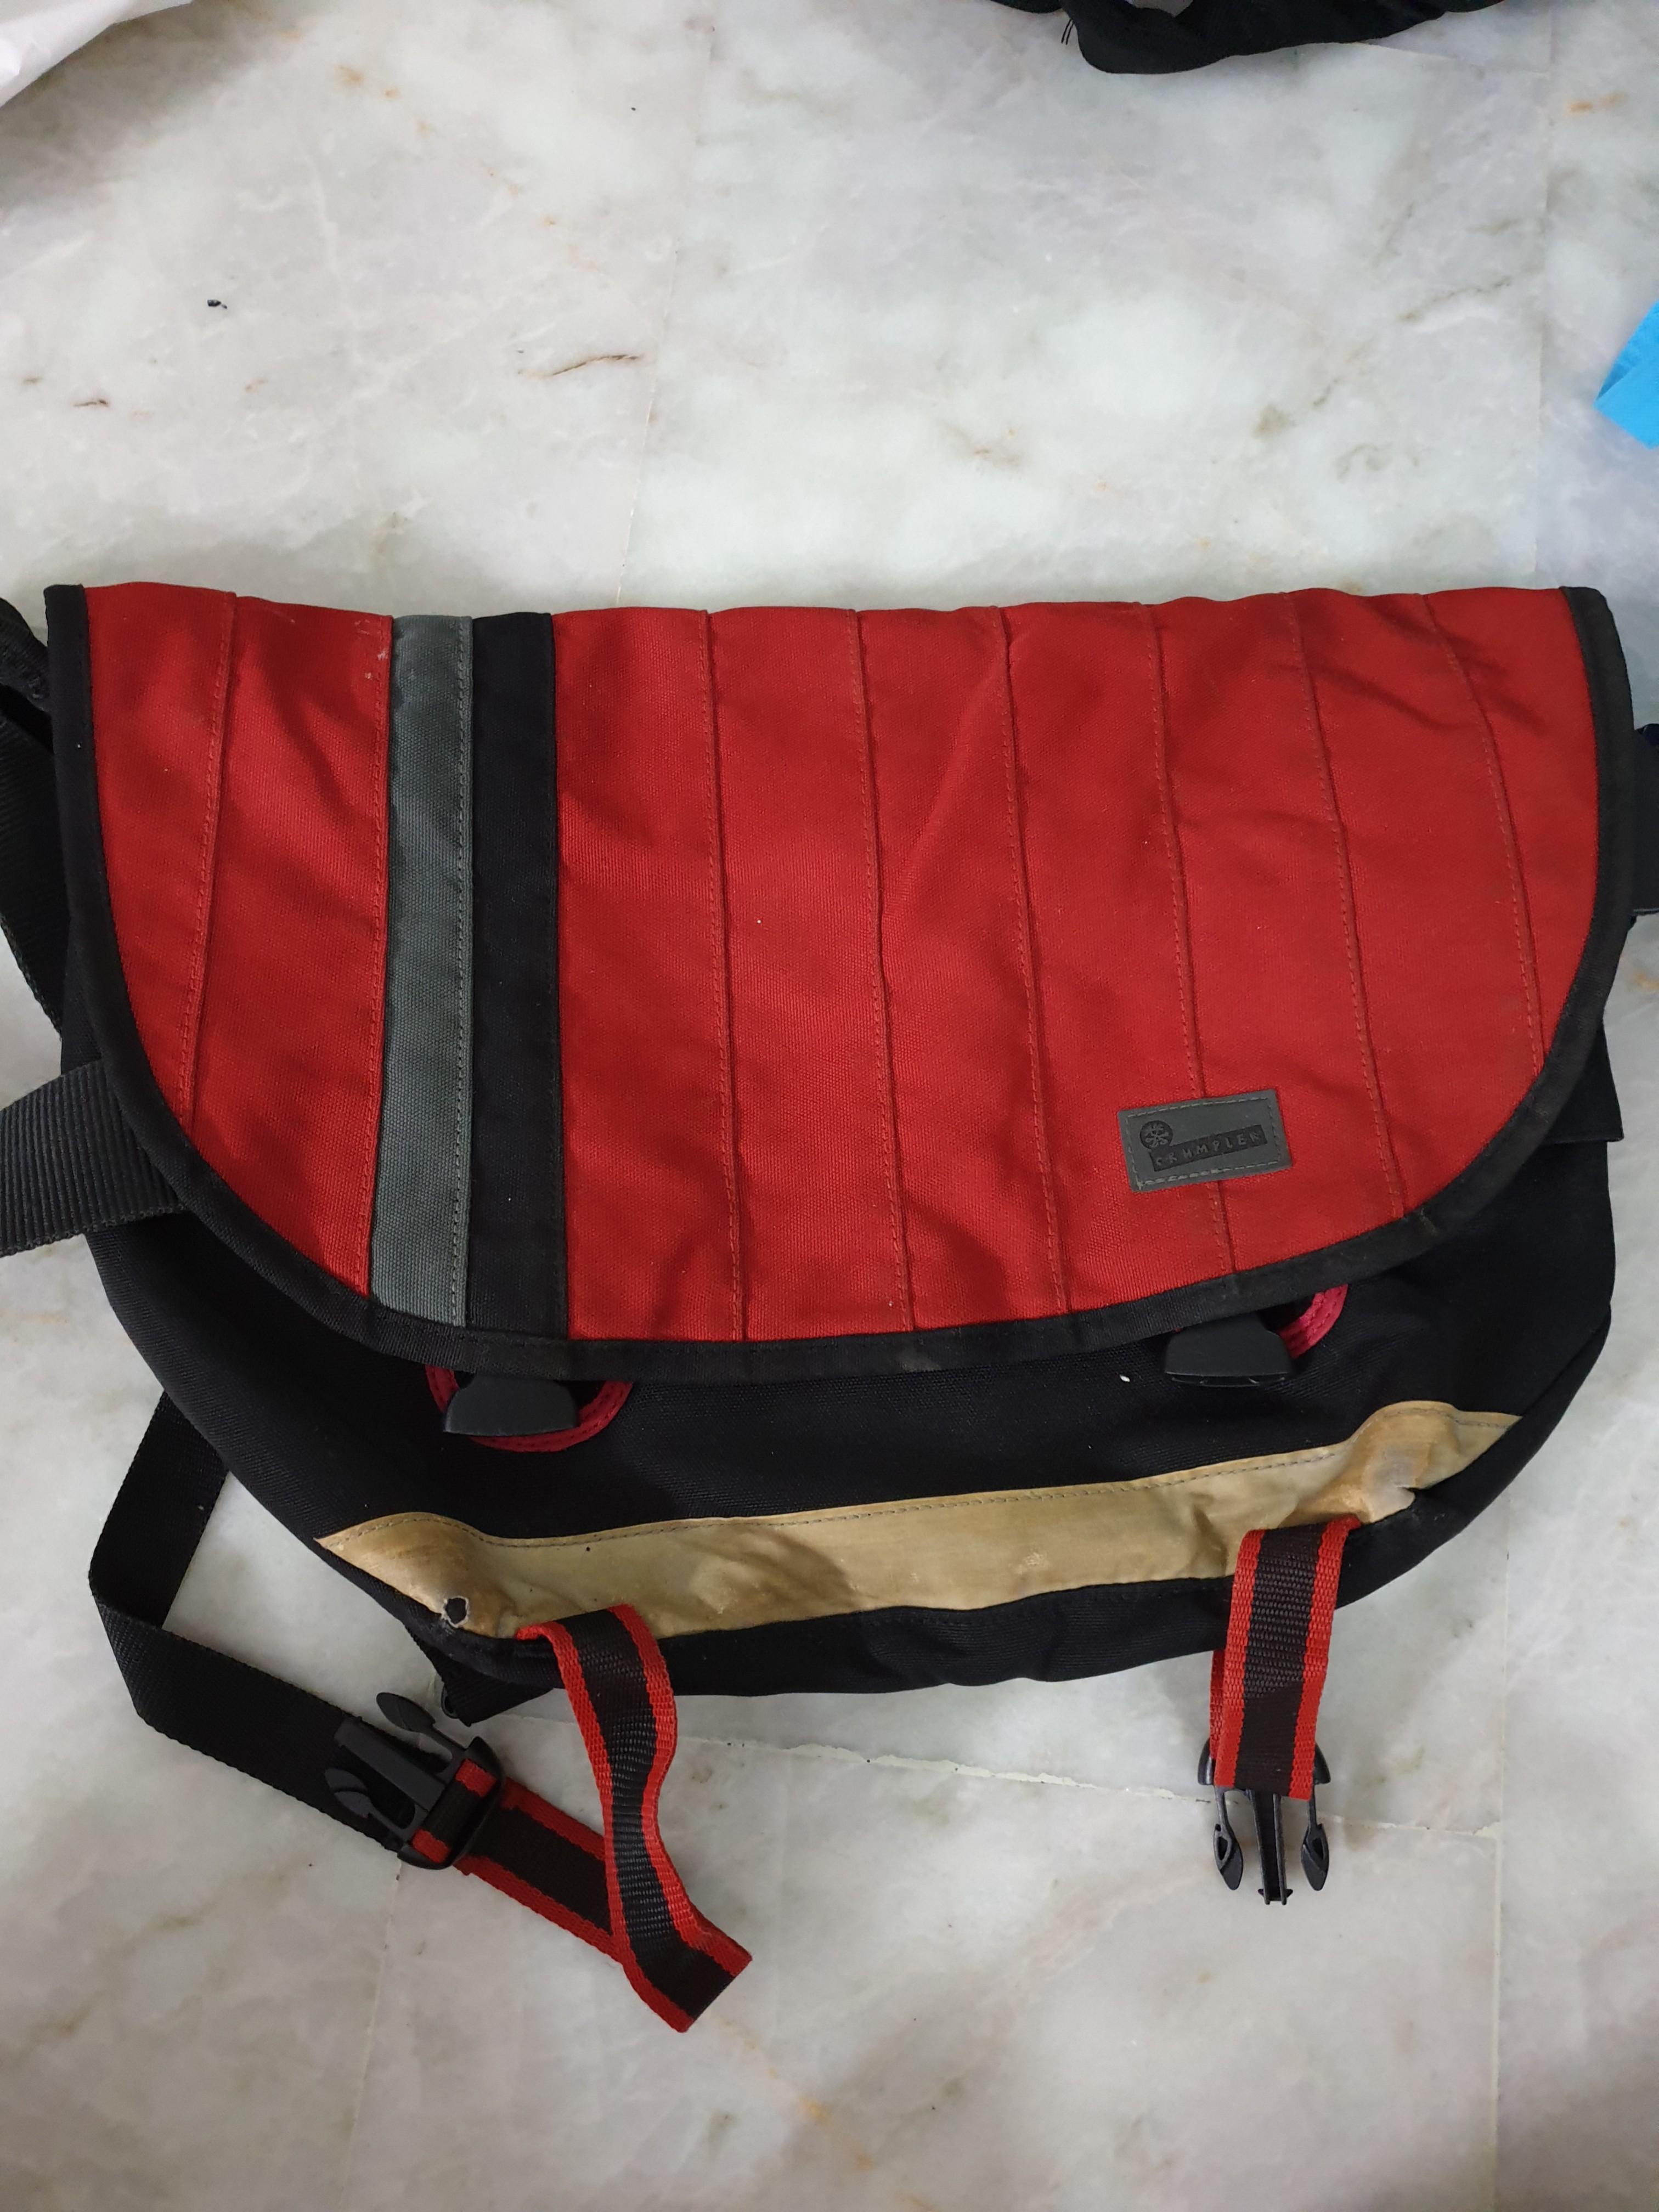 5d06423038e3 Crumpler Messenger bag - Large